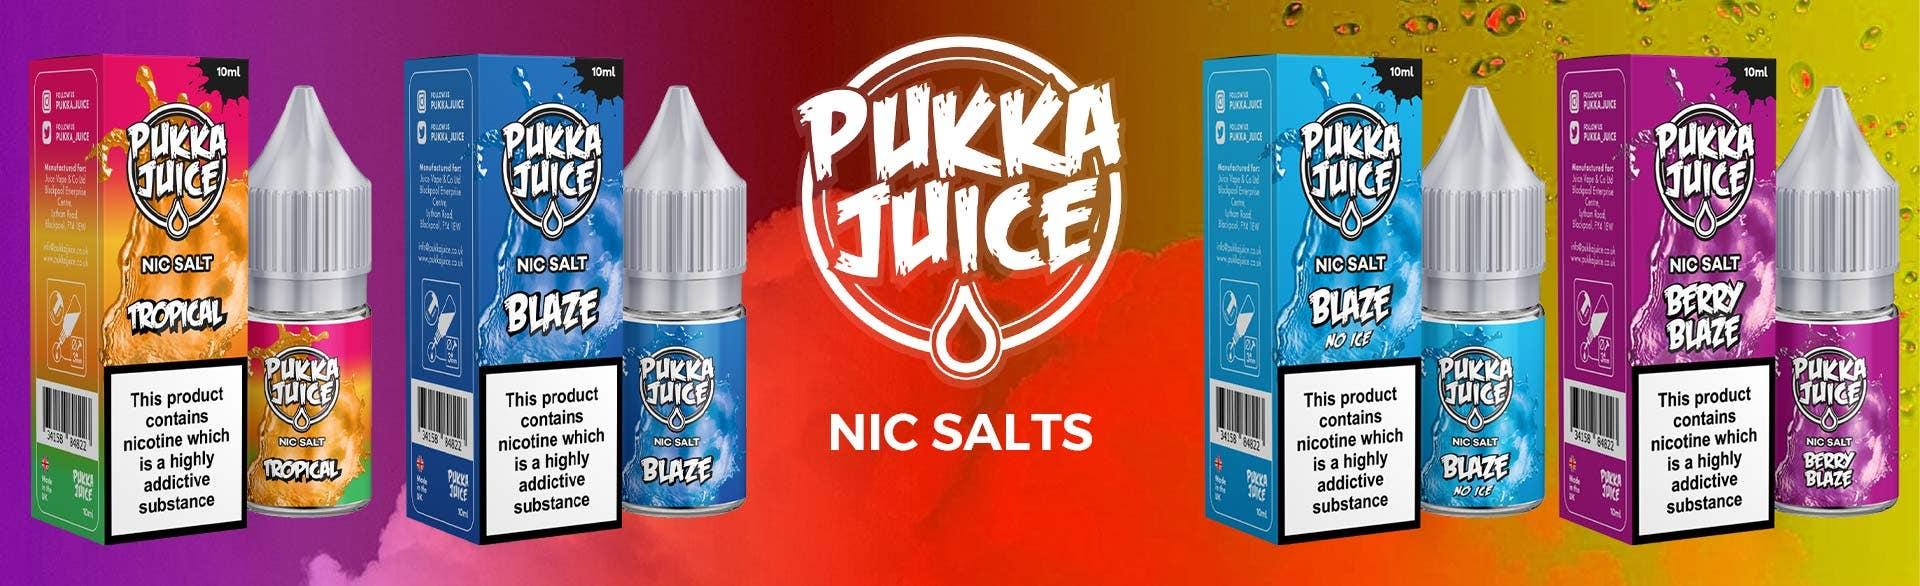 Pukka Juice